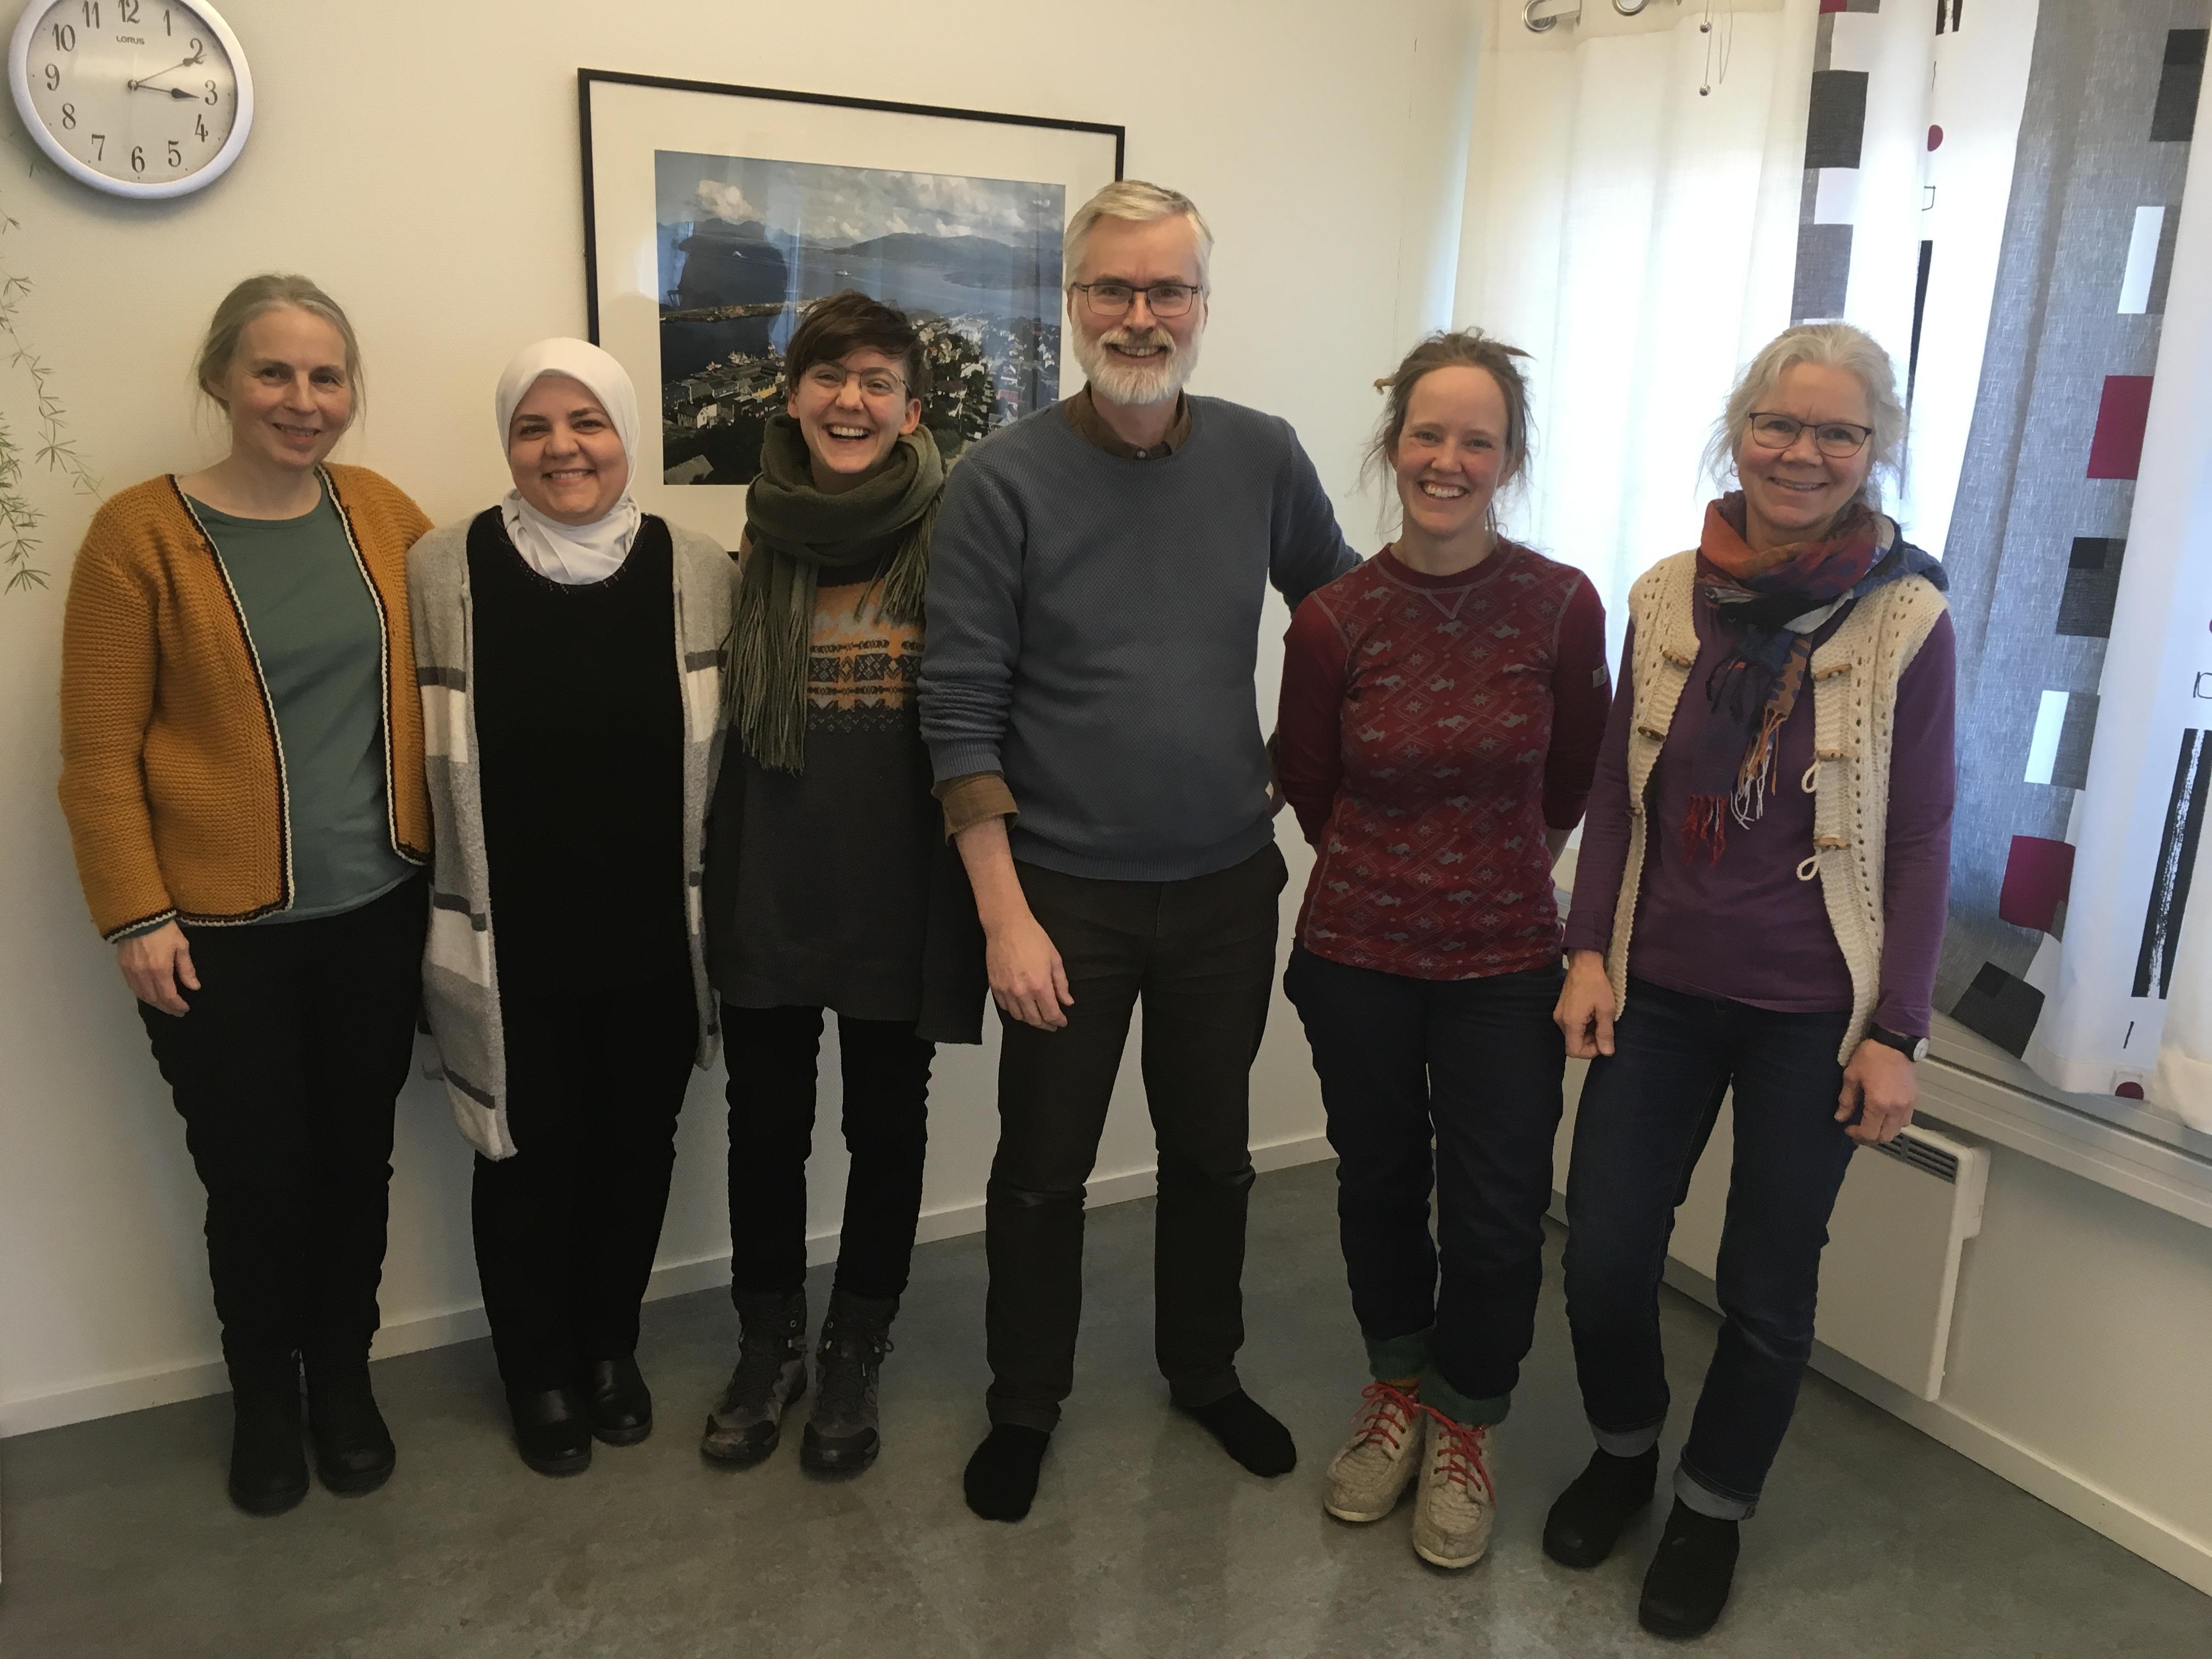 Årsmøte i stiftelsen Peacepainting 2019